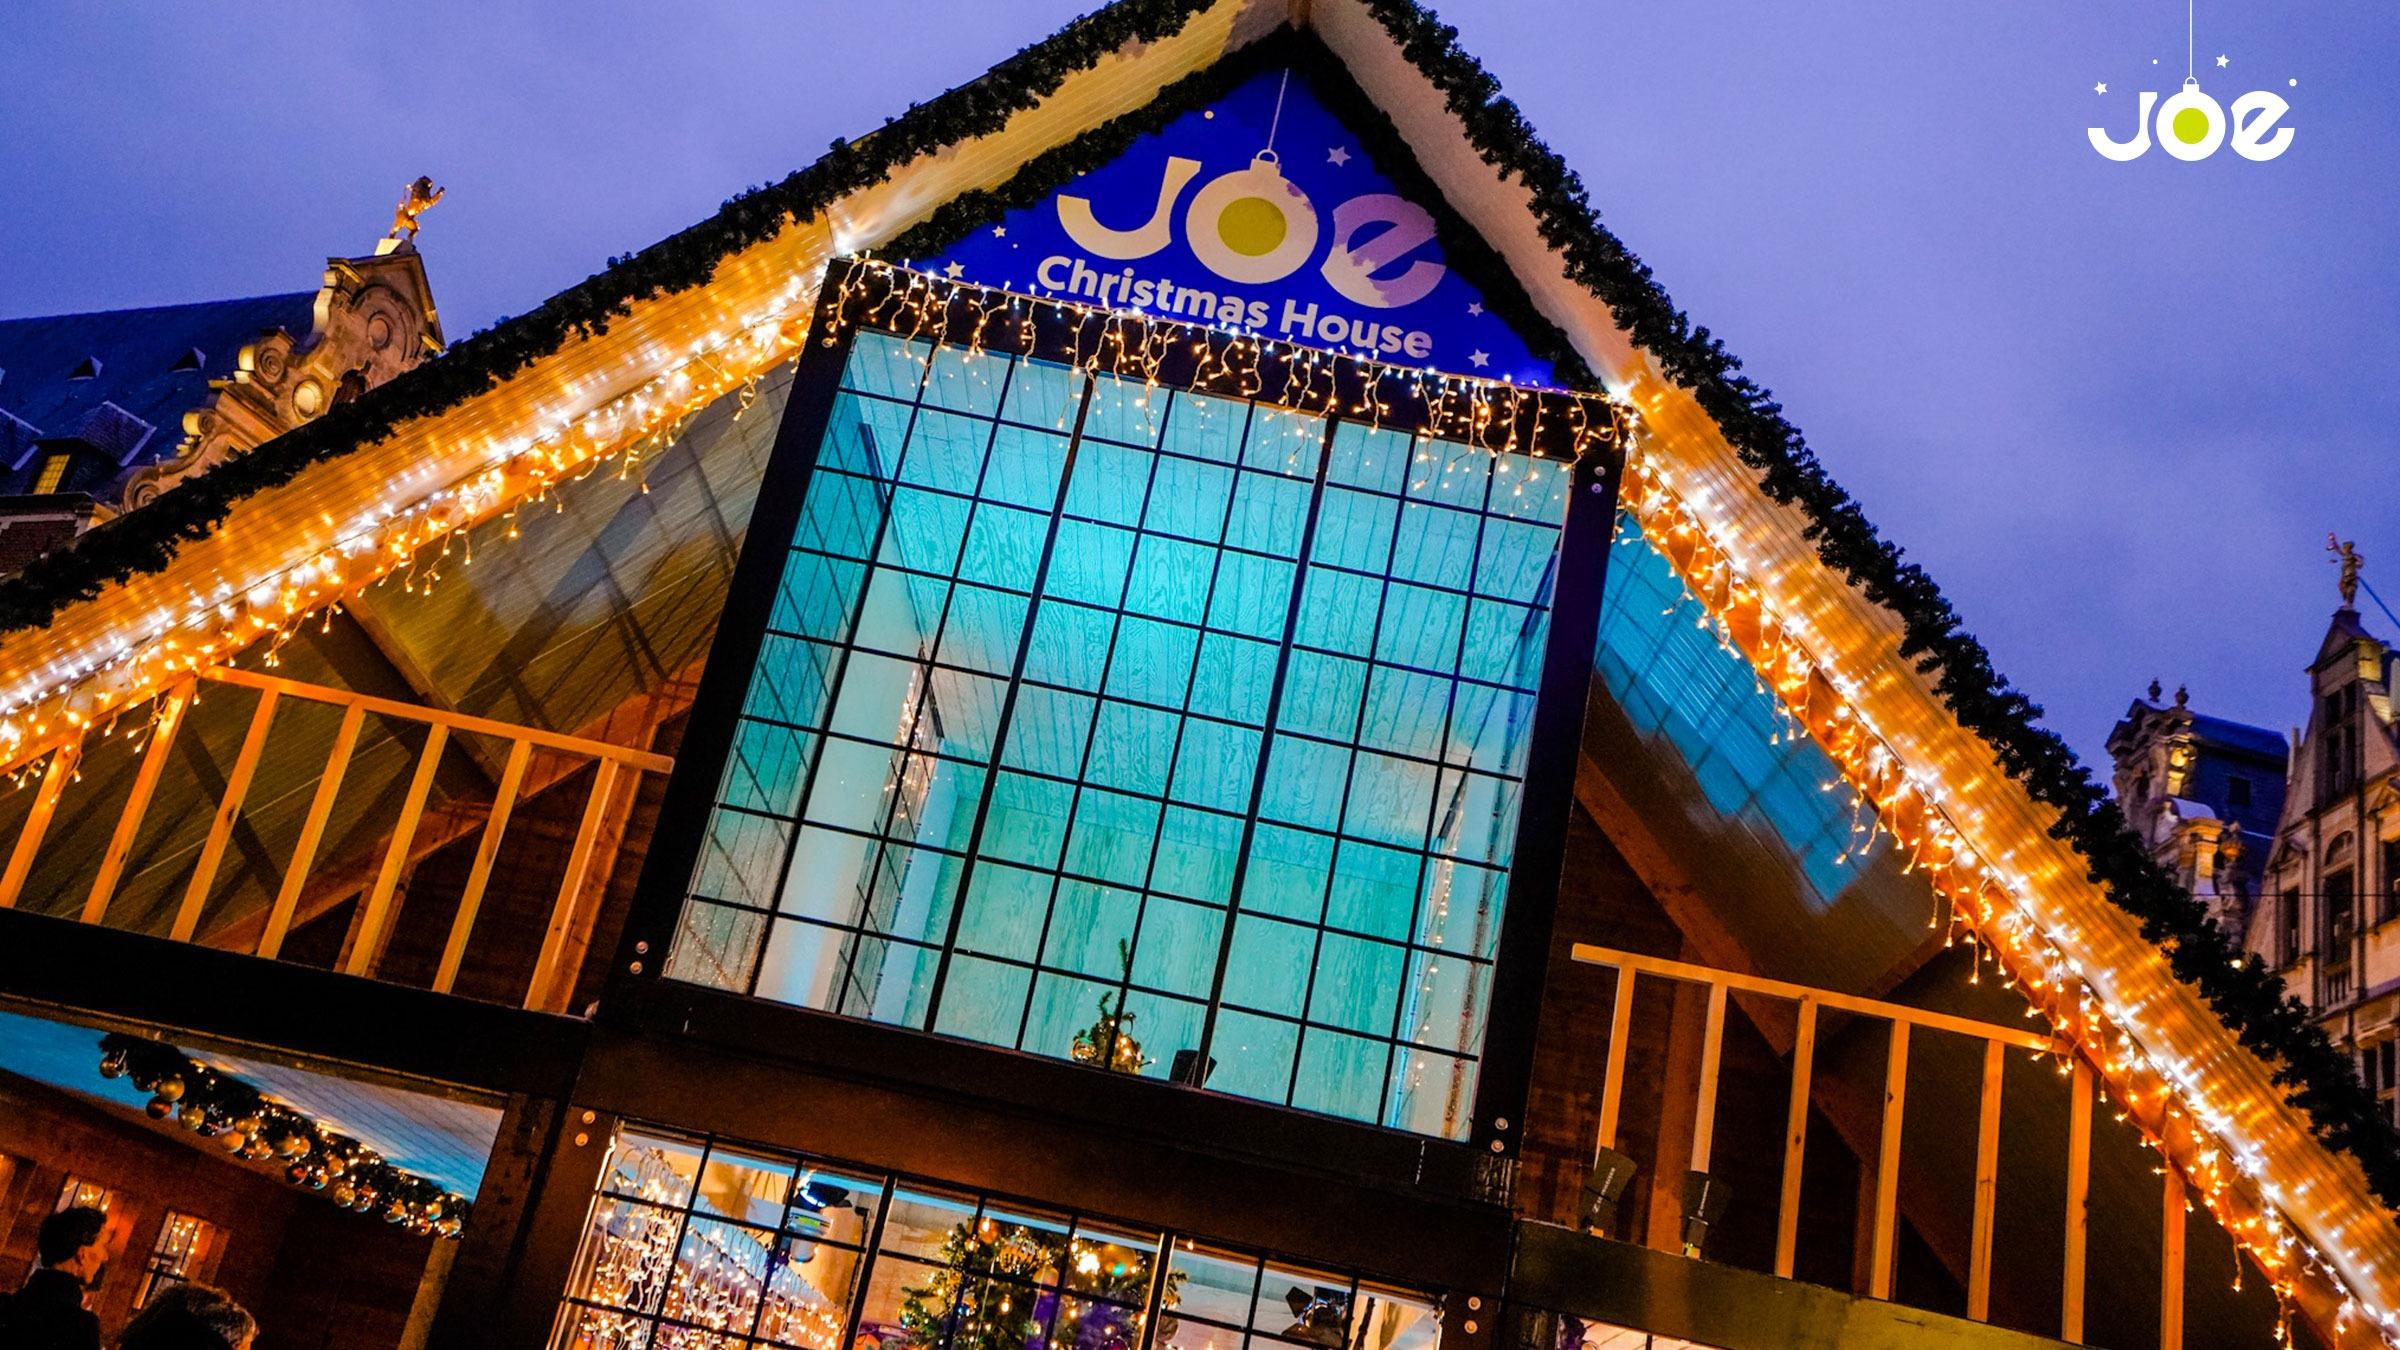 Joe christmashouse avond